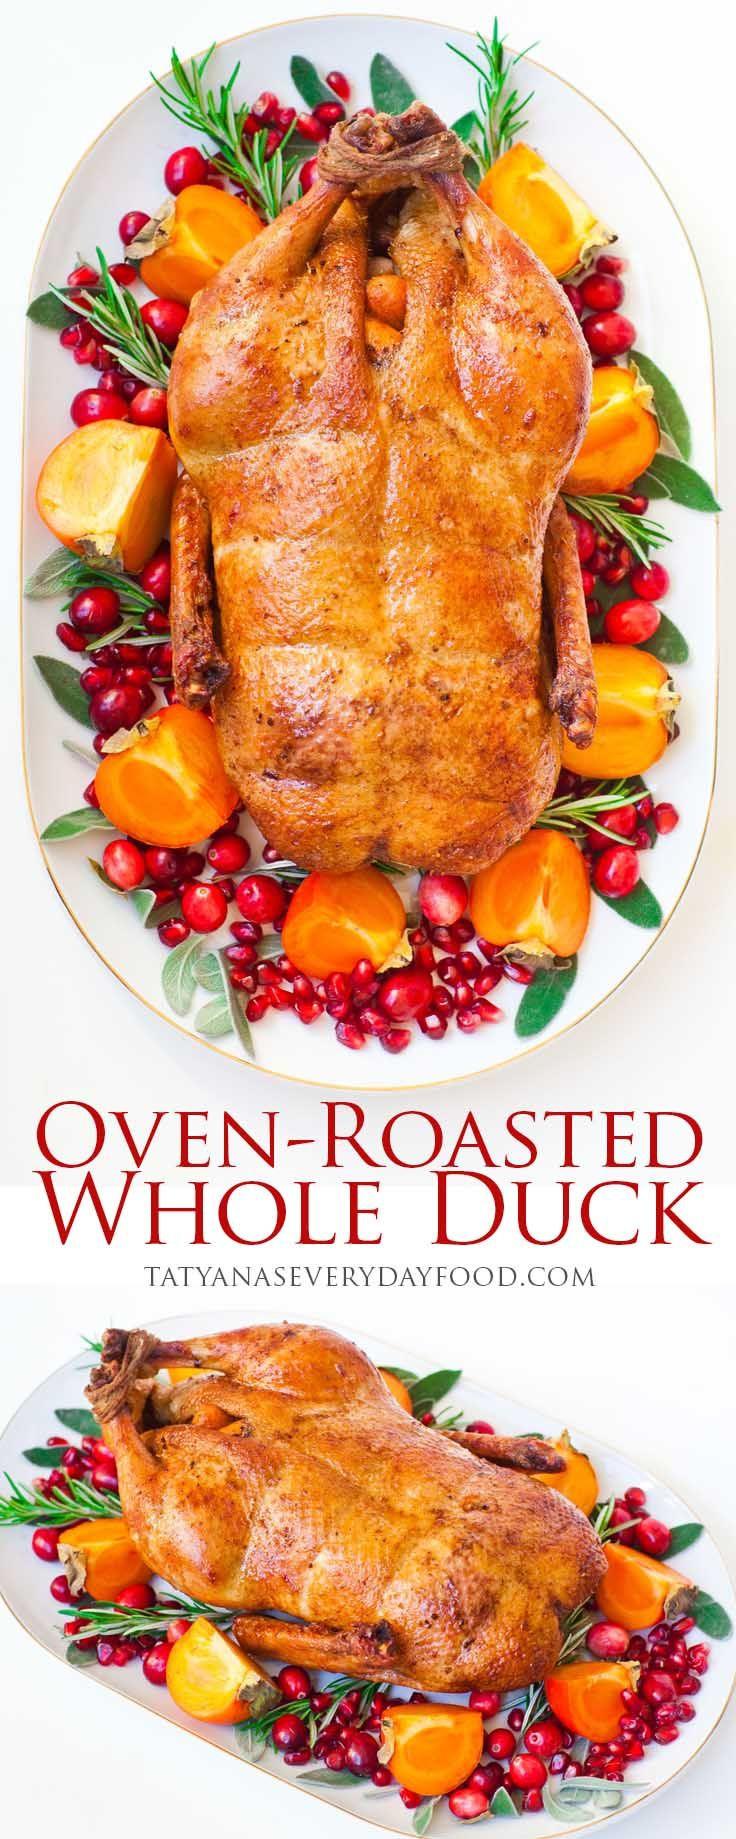 Duck Recipes For Thanksgiving  Best 25 Roast duck ideas on Pinterest